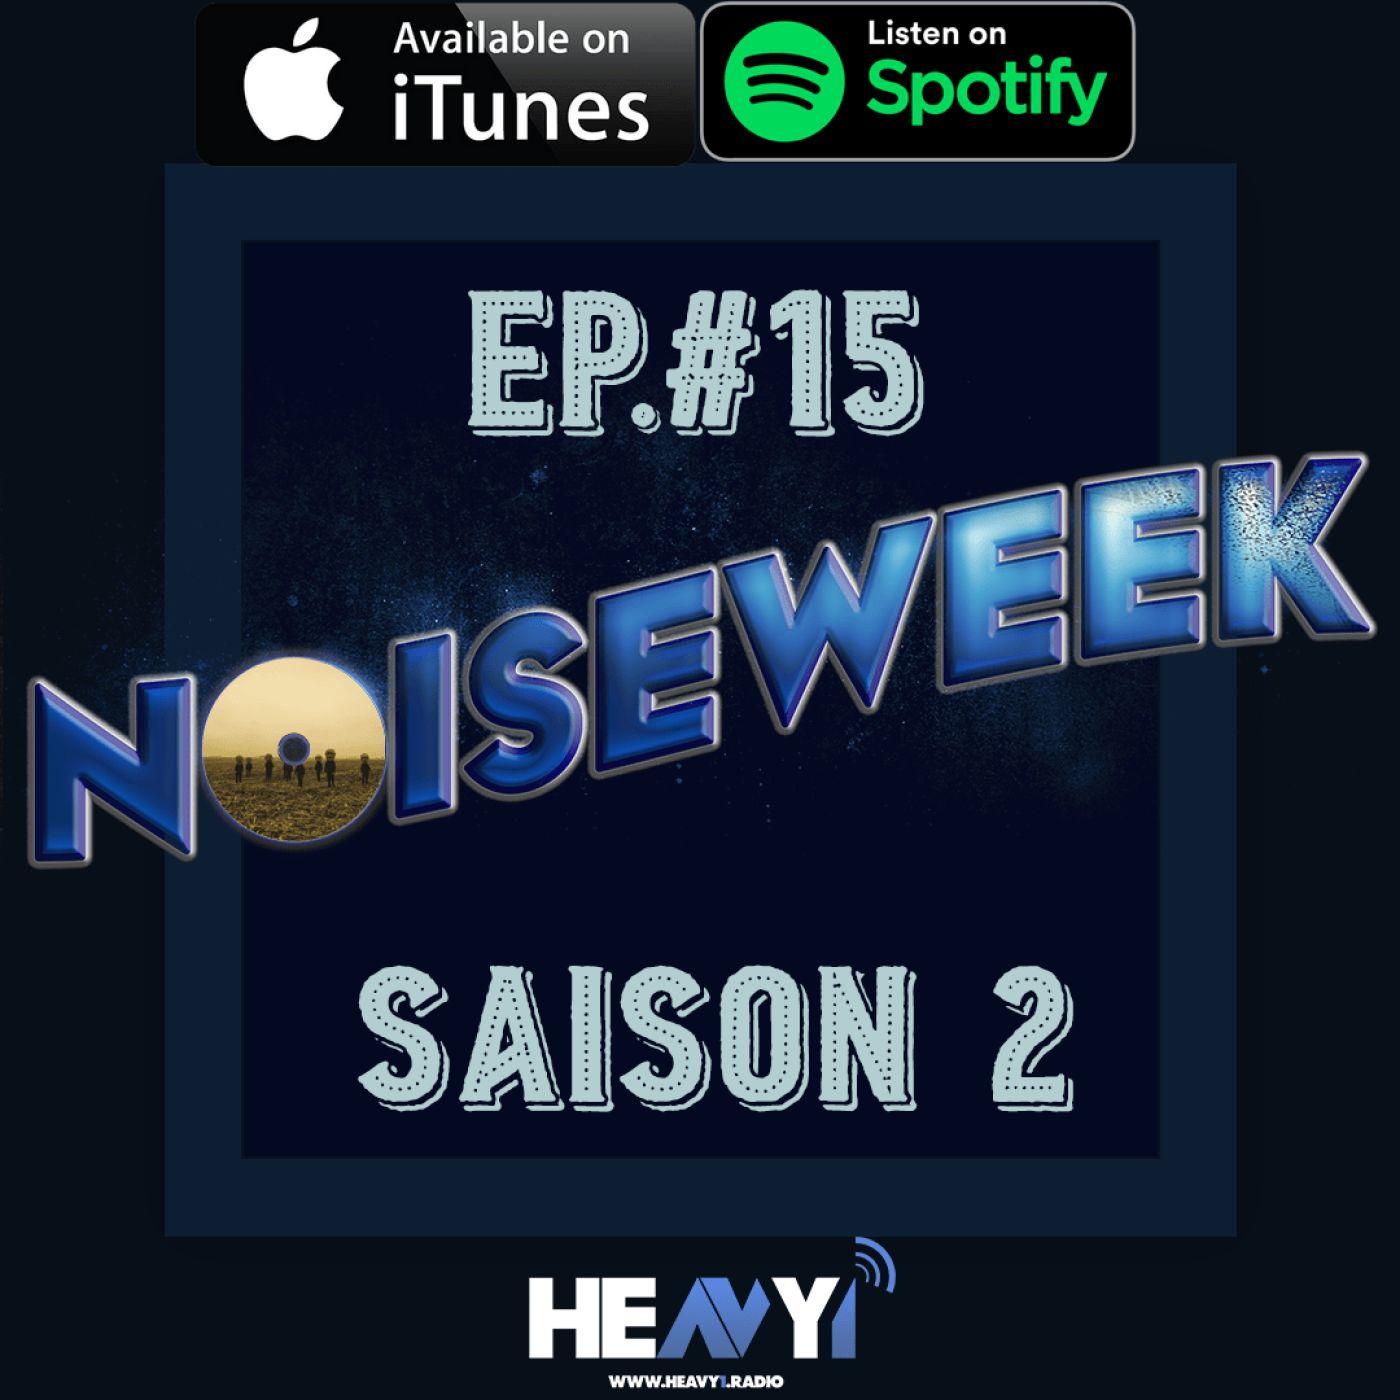 Noiseweek #15 Saison 2